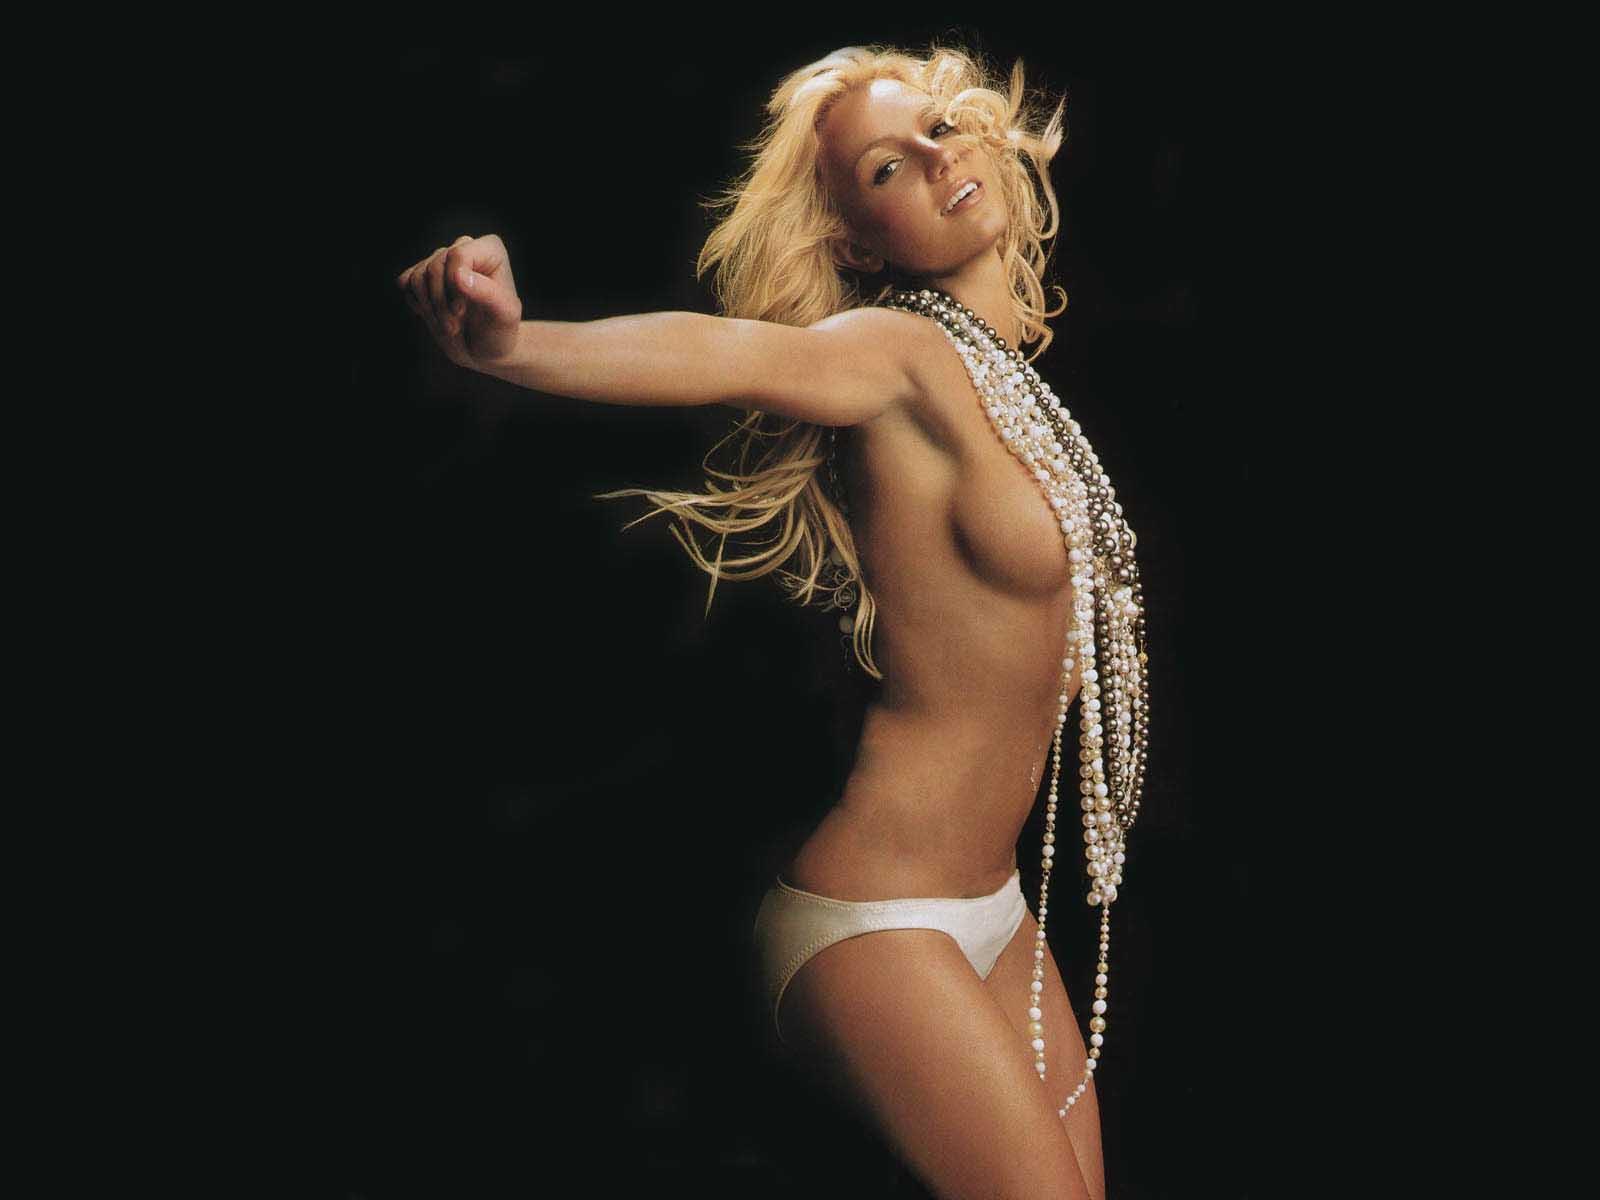 http://1.bp.blogspot.com/_EFWNErFYa6A/TSysnzuoVvI/AAAAAAAAC2U/hpI97Nn8vcA/s1600/Britney+Spears.jpg